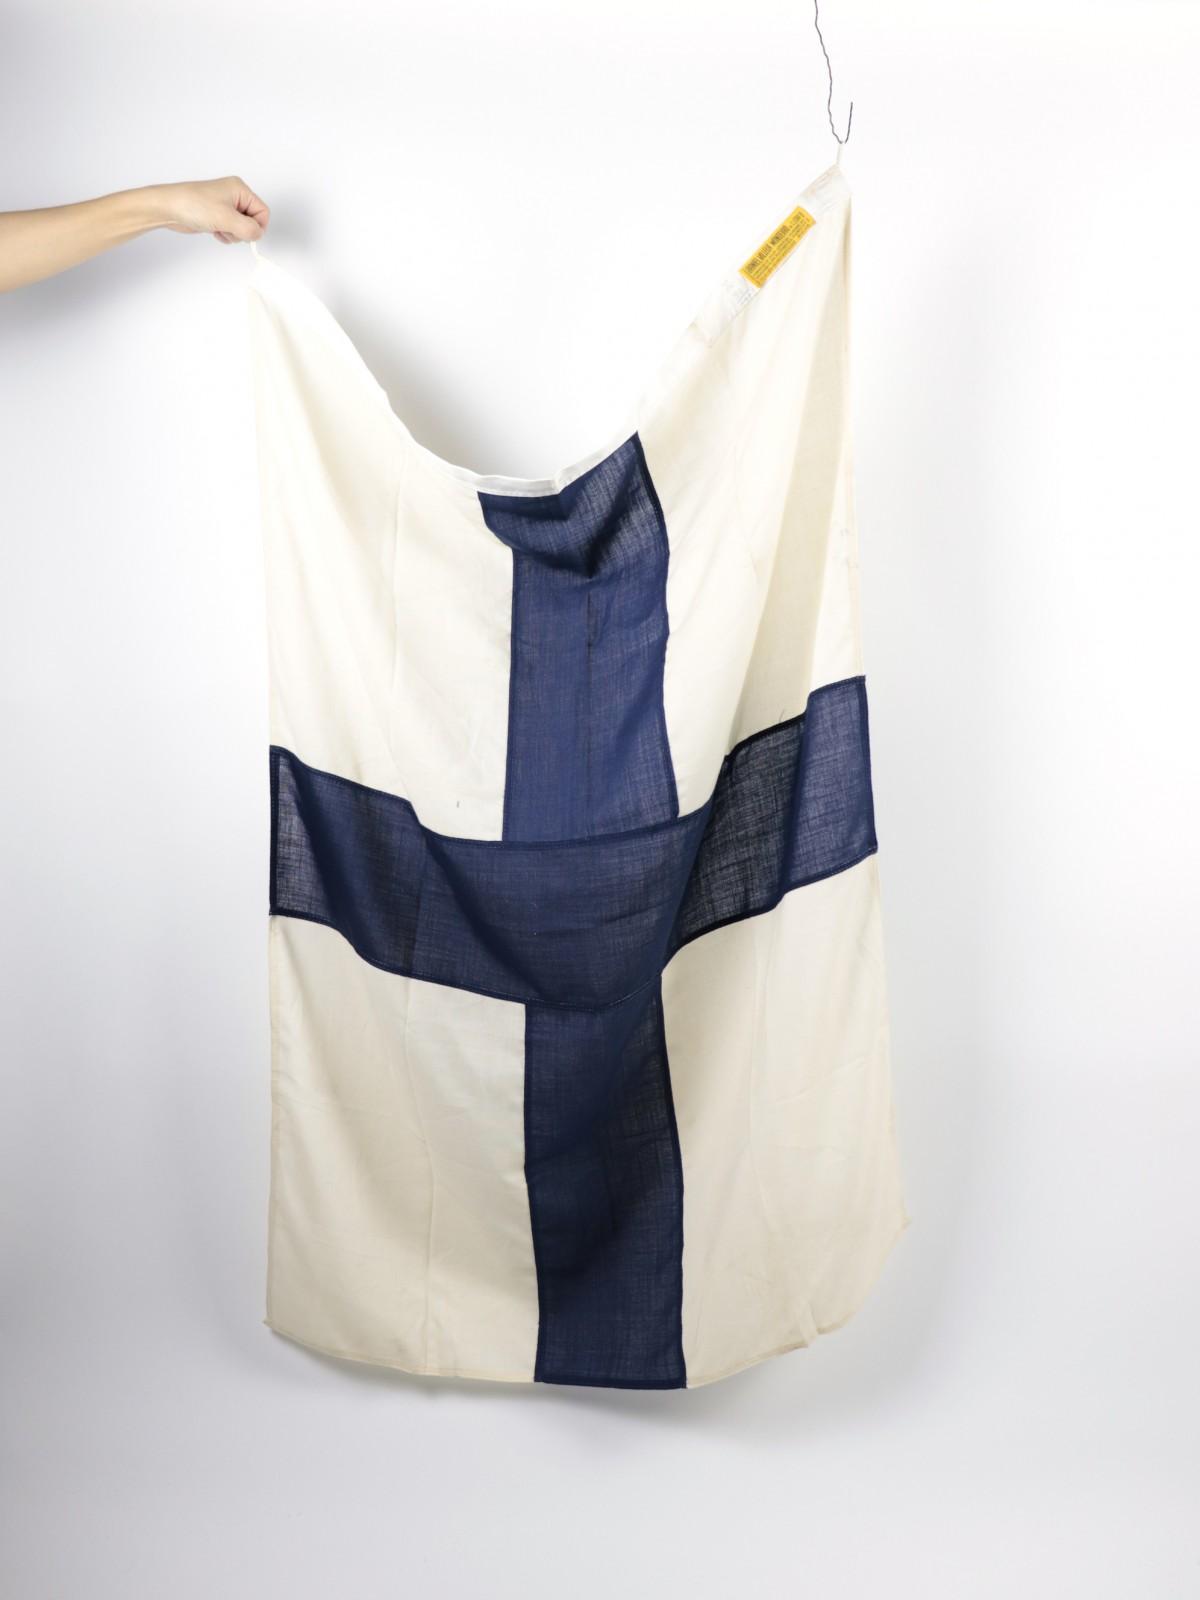 Signal Flag, Maritime, USA